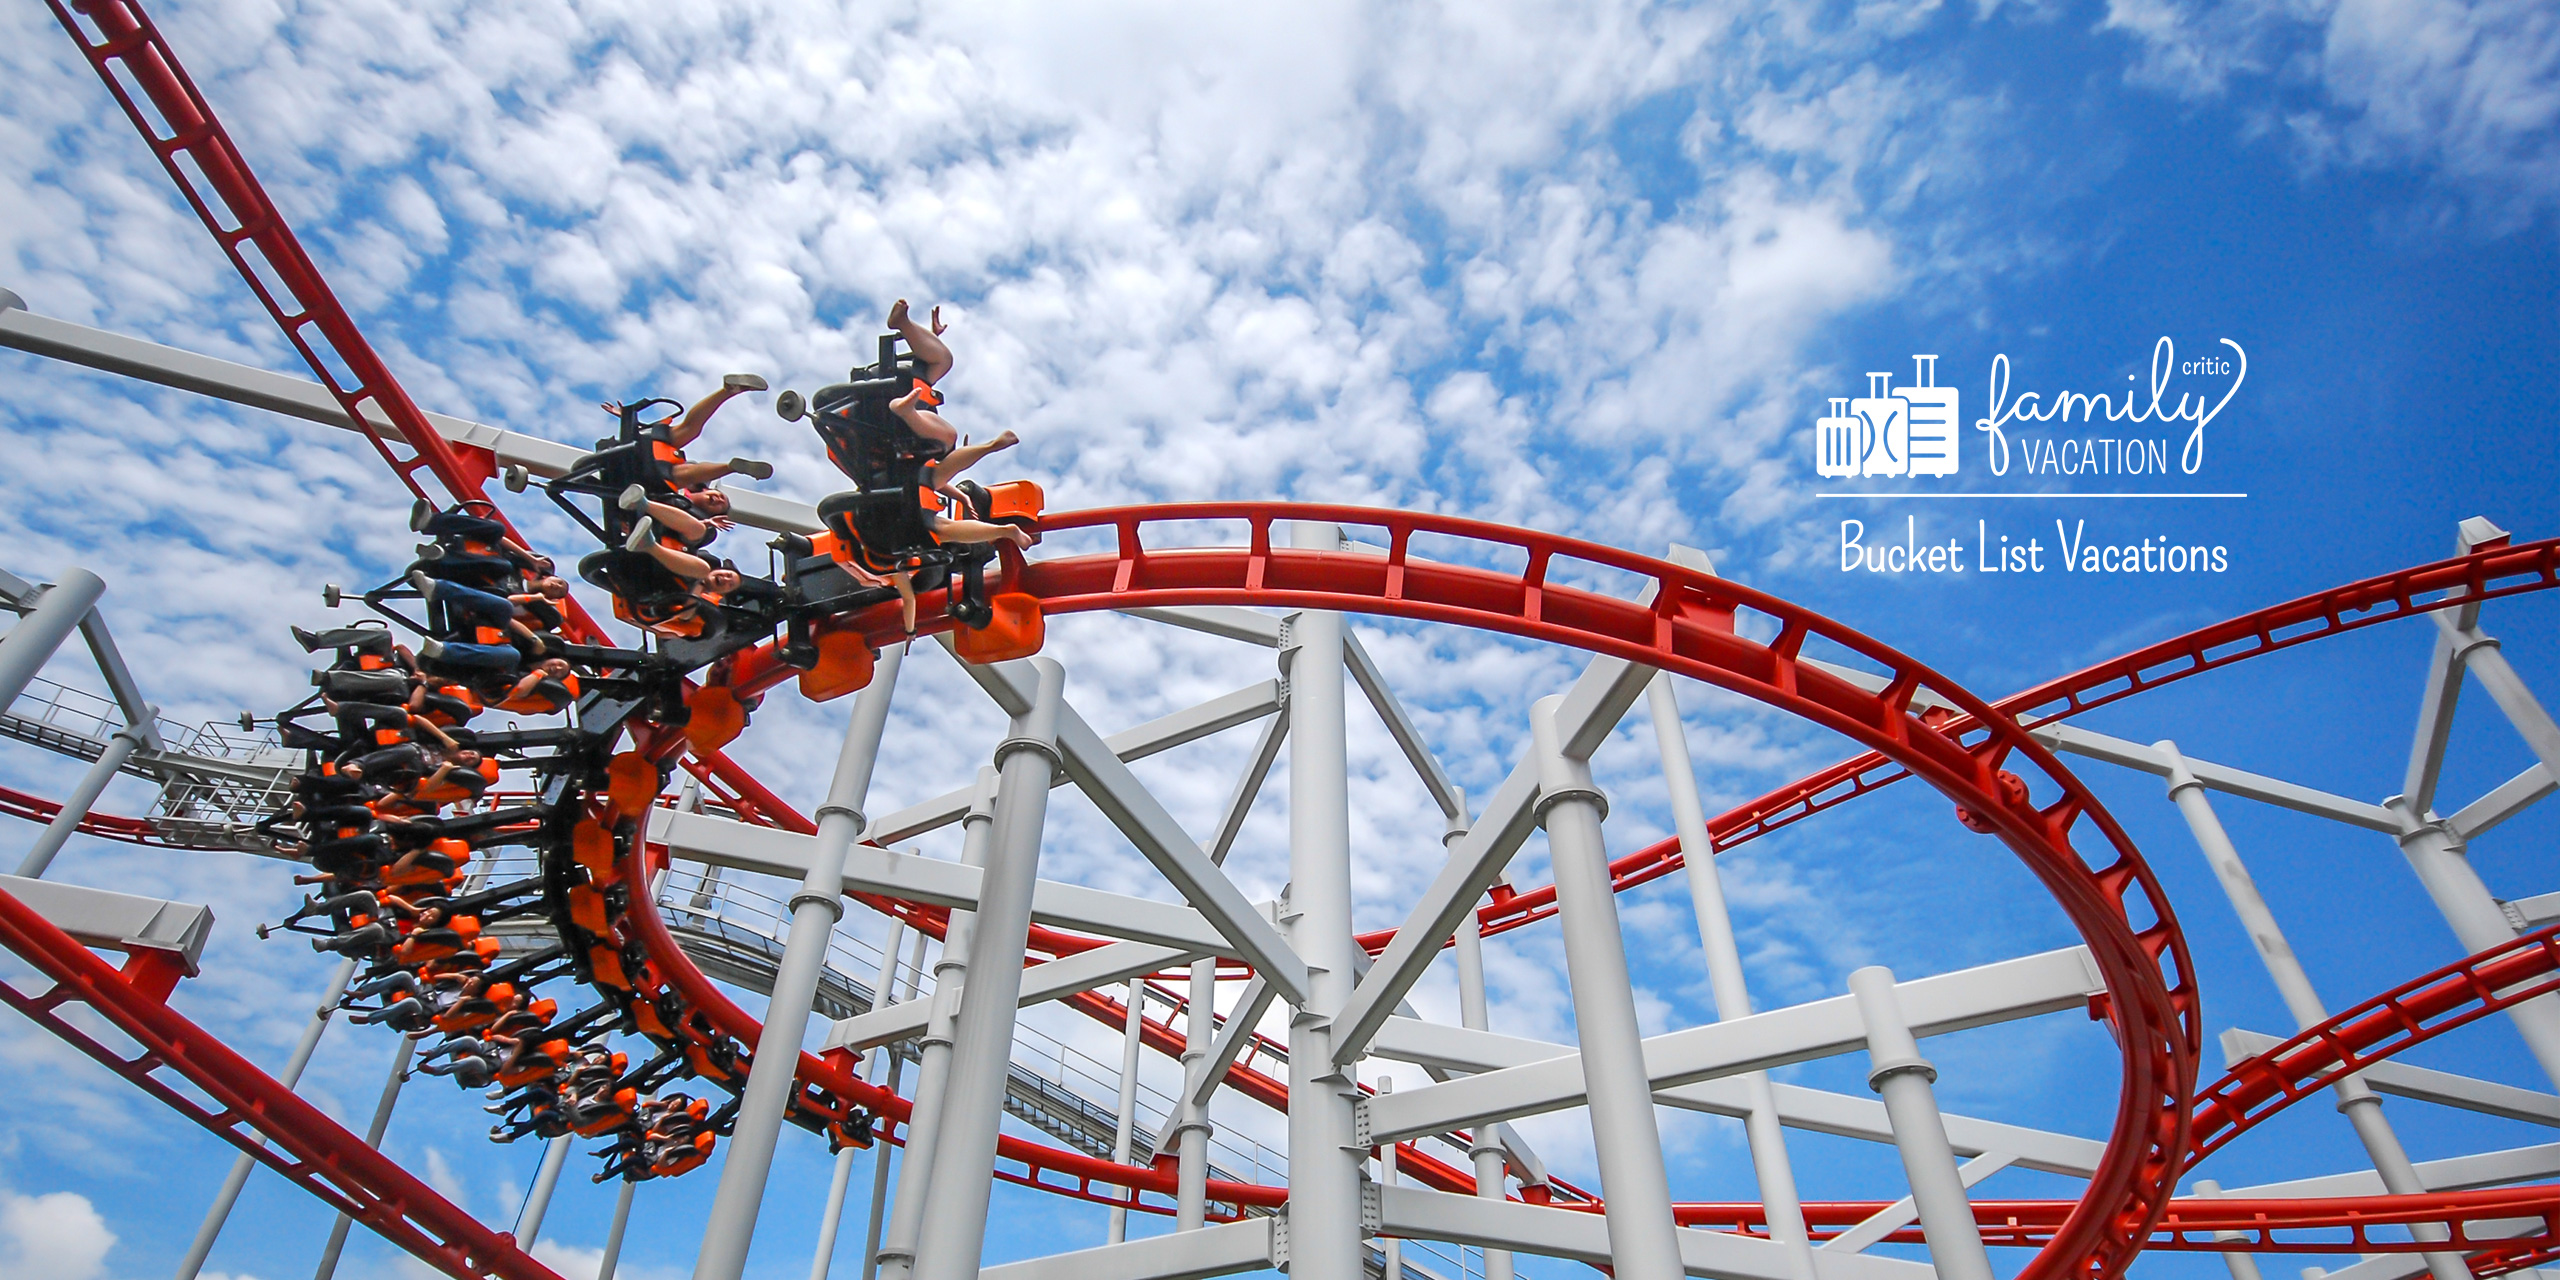 Rollercoaster against blue sky; Courtesy SIHASAKPRACHUM/Shutterstock